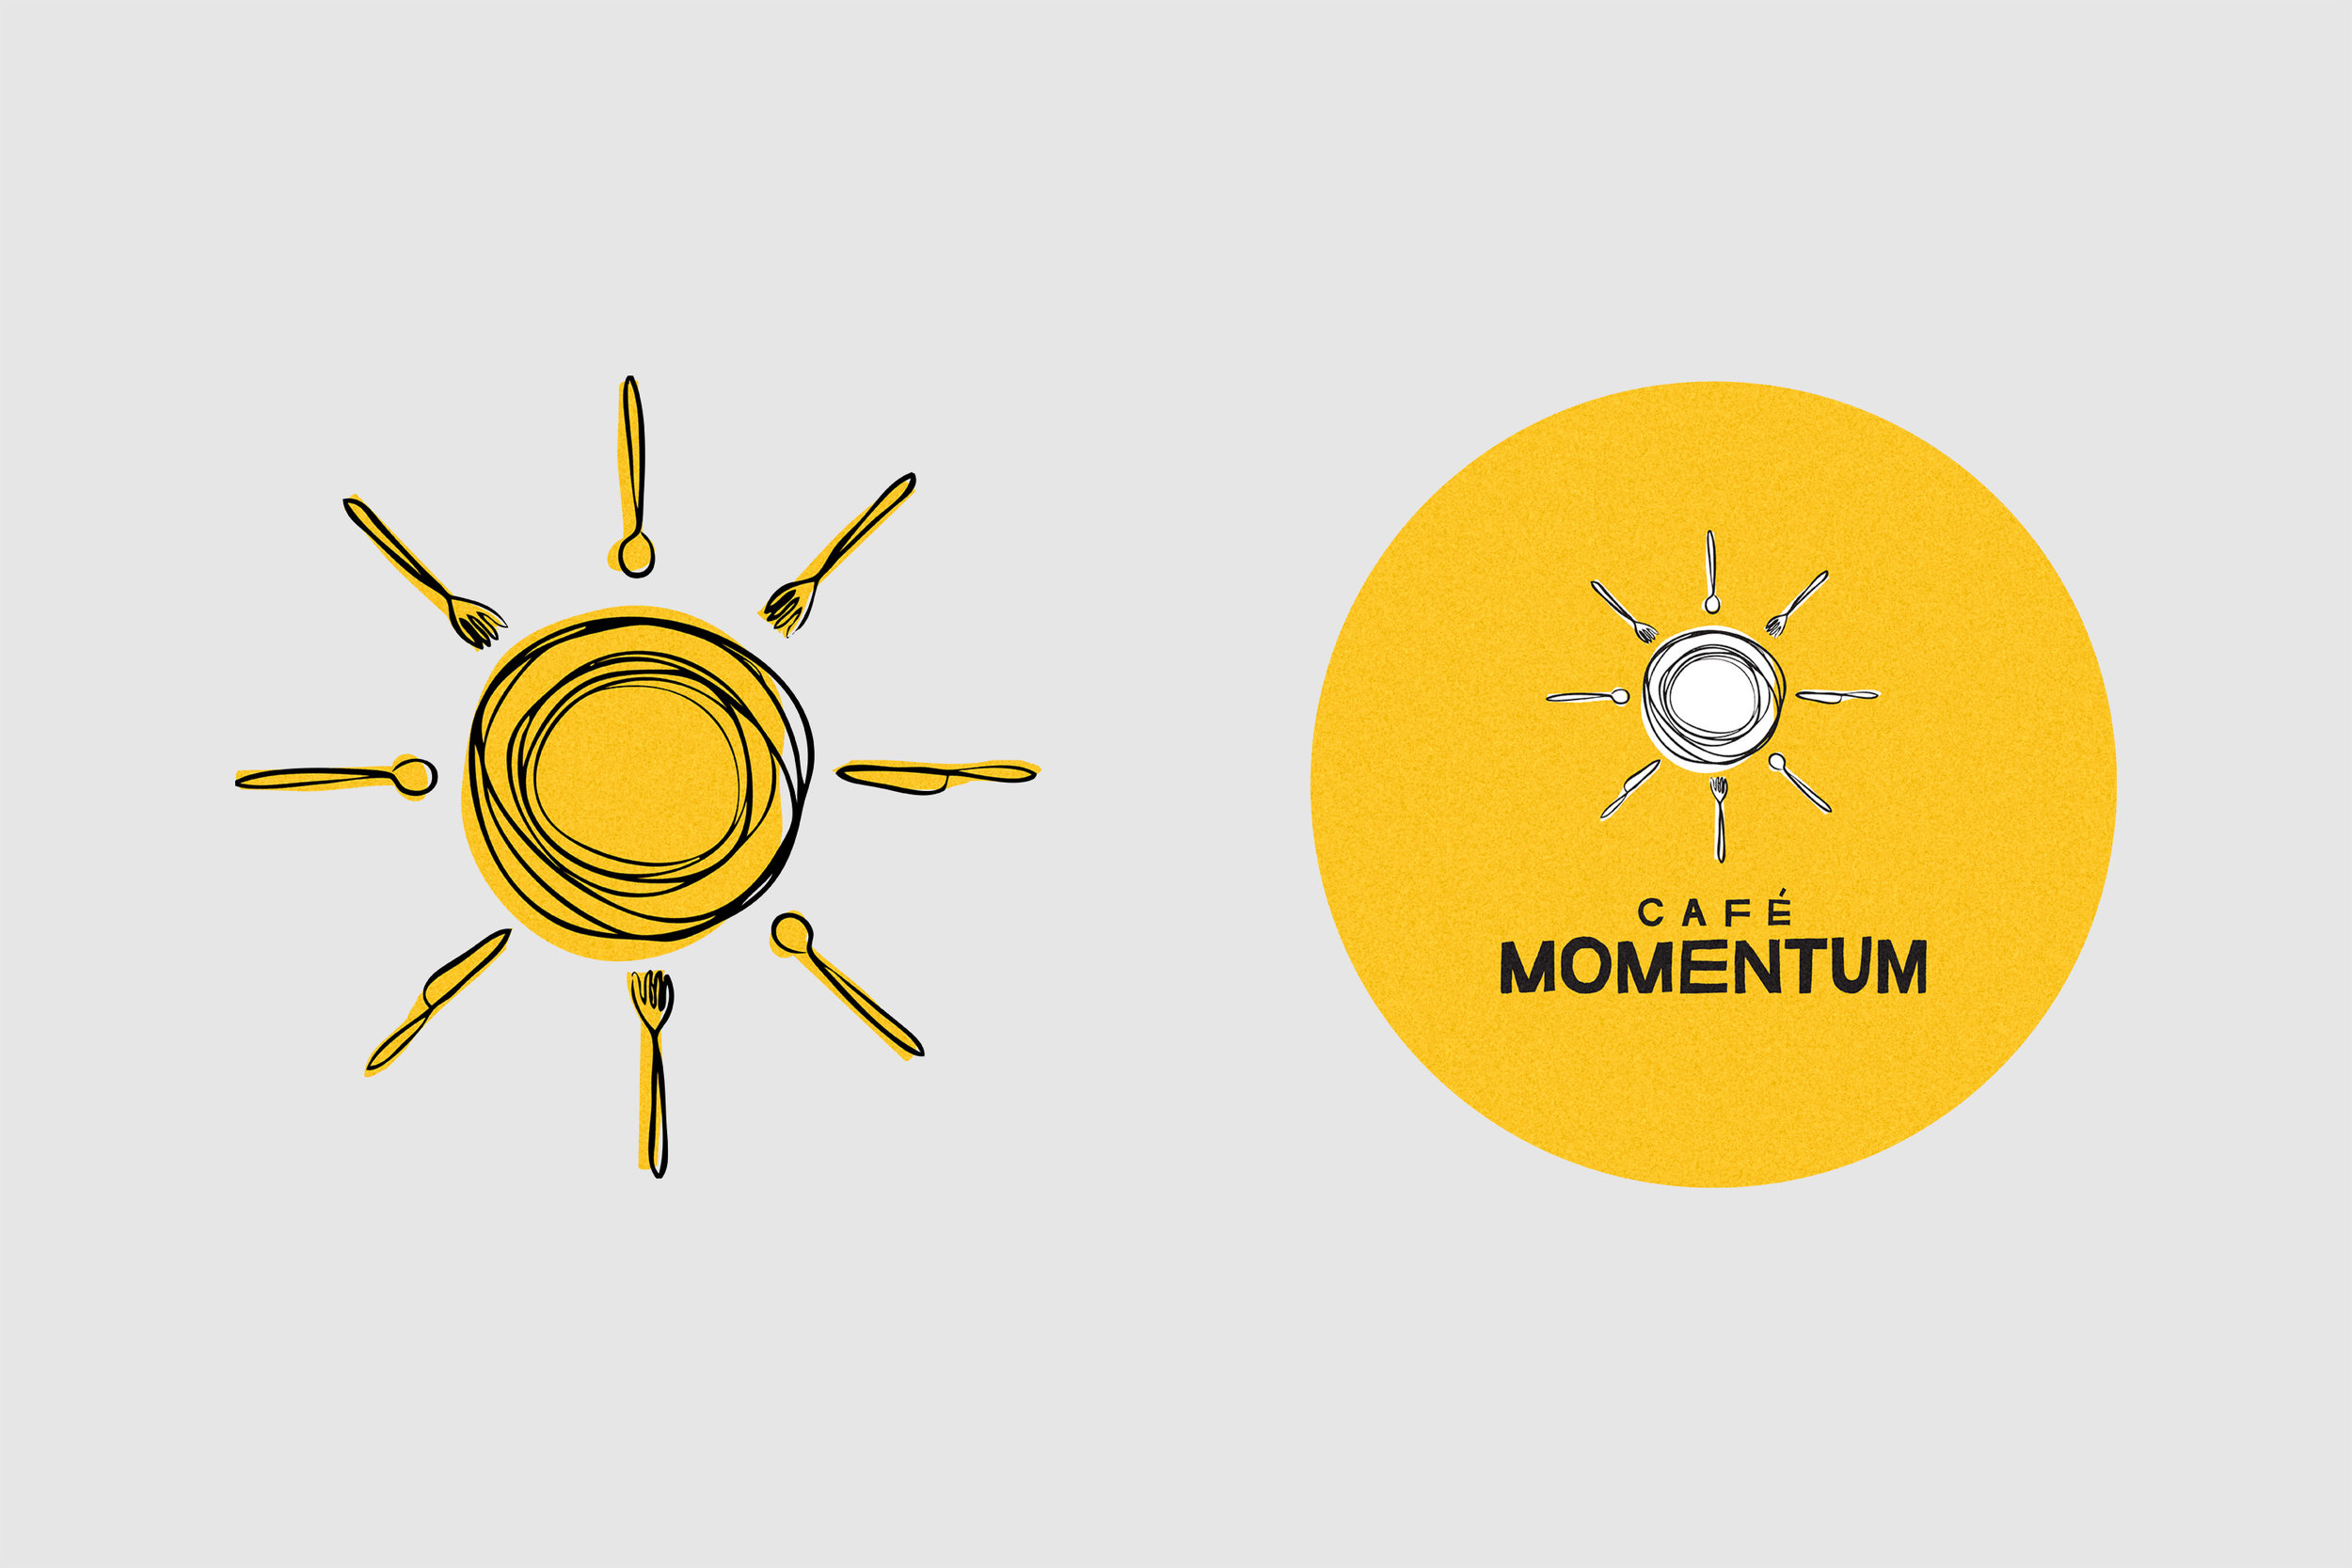 ronaldvillegas-cafe-momentum-identity-logo-icon.jpg